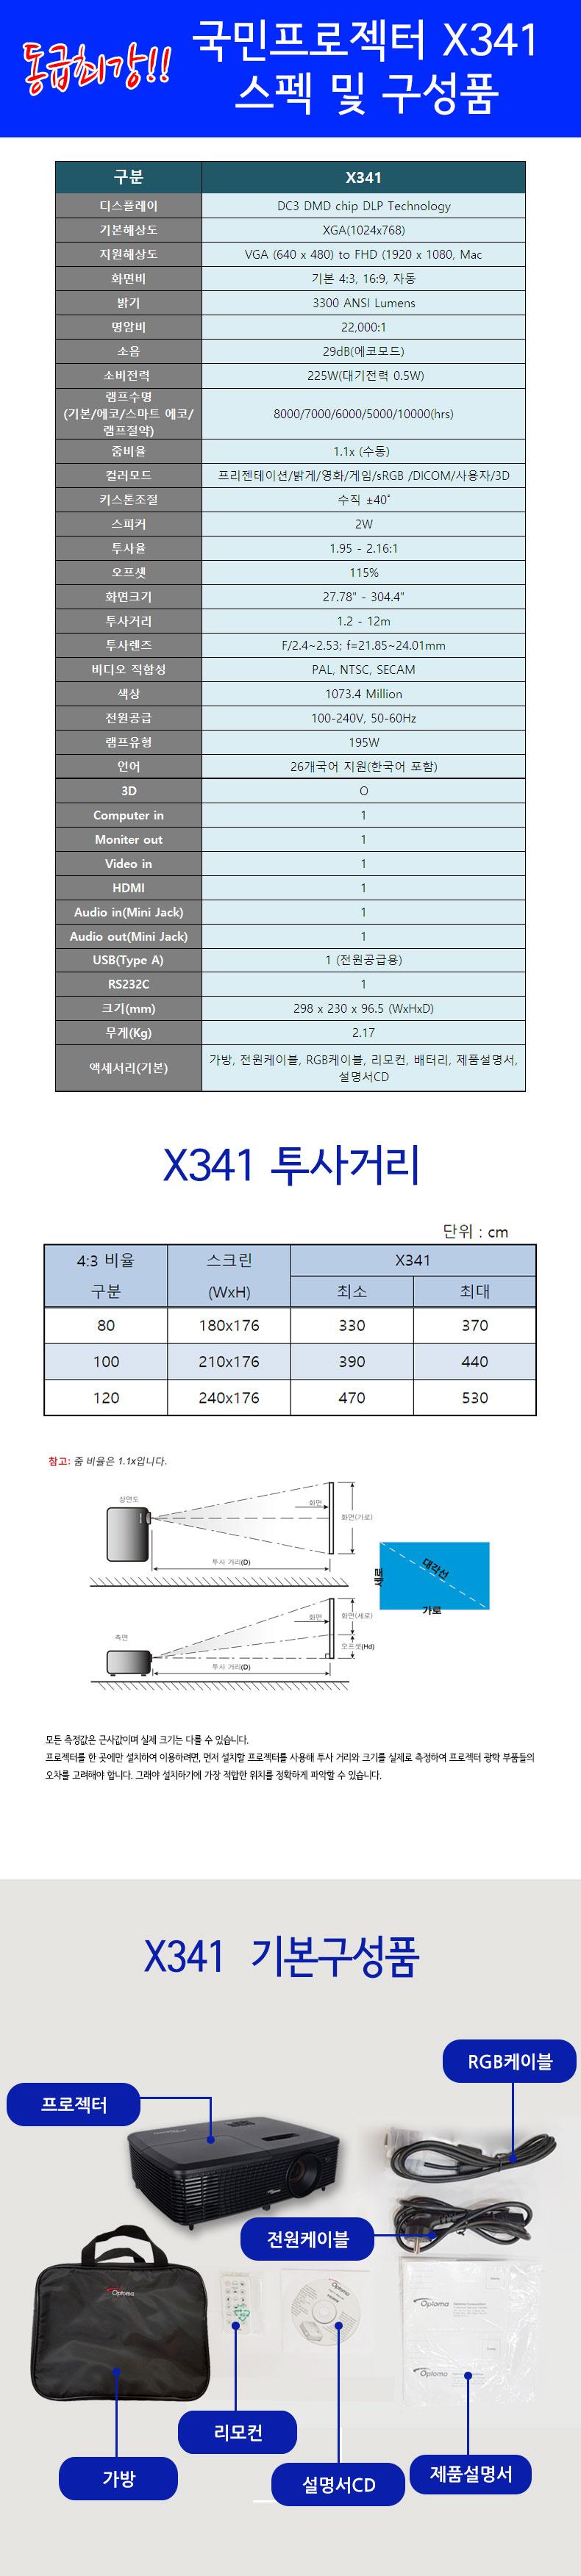 X341 옵토마 xga 프로젝터 3300안시 x341